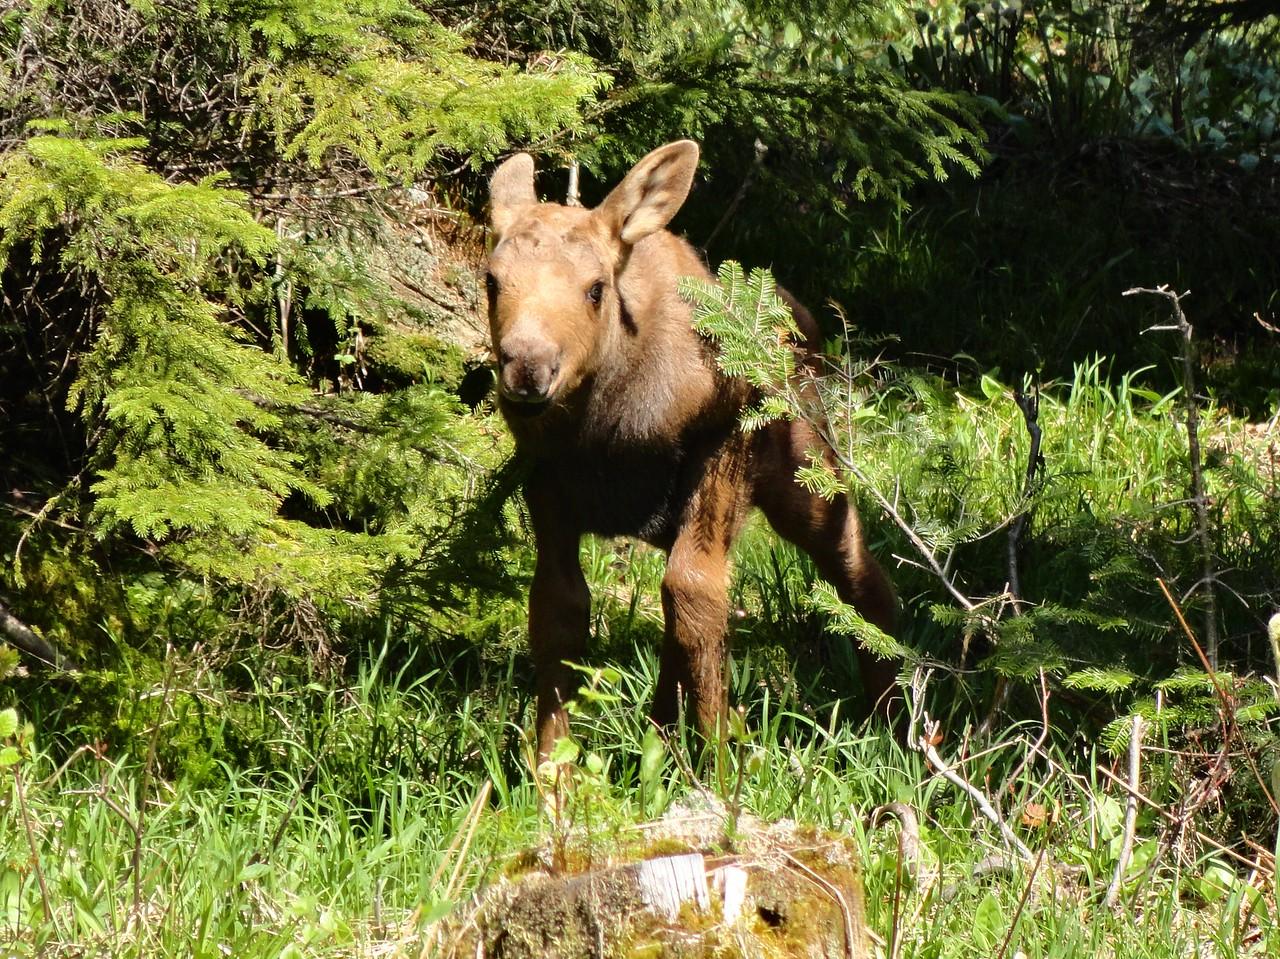 Newborn moose calf, May 2012